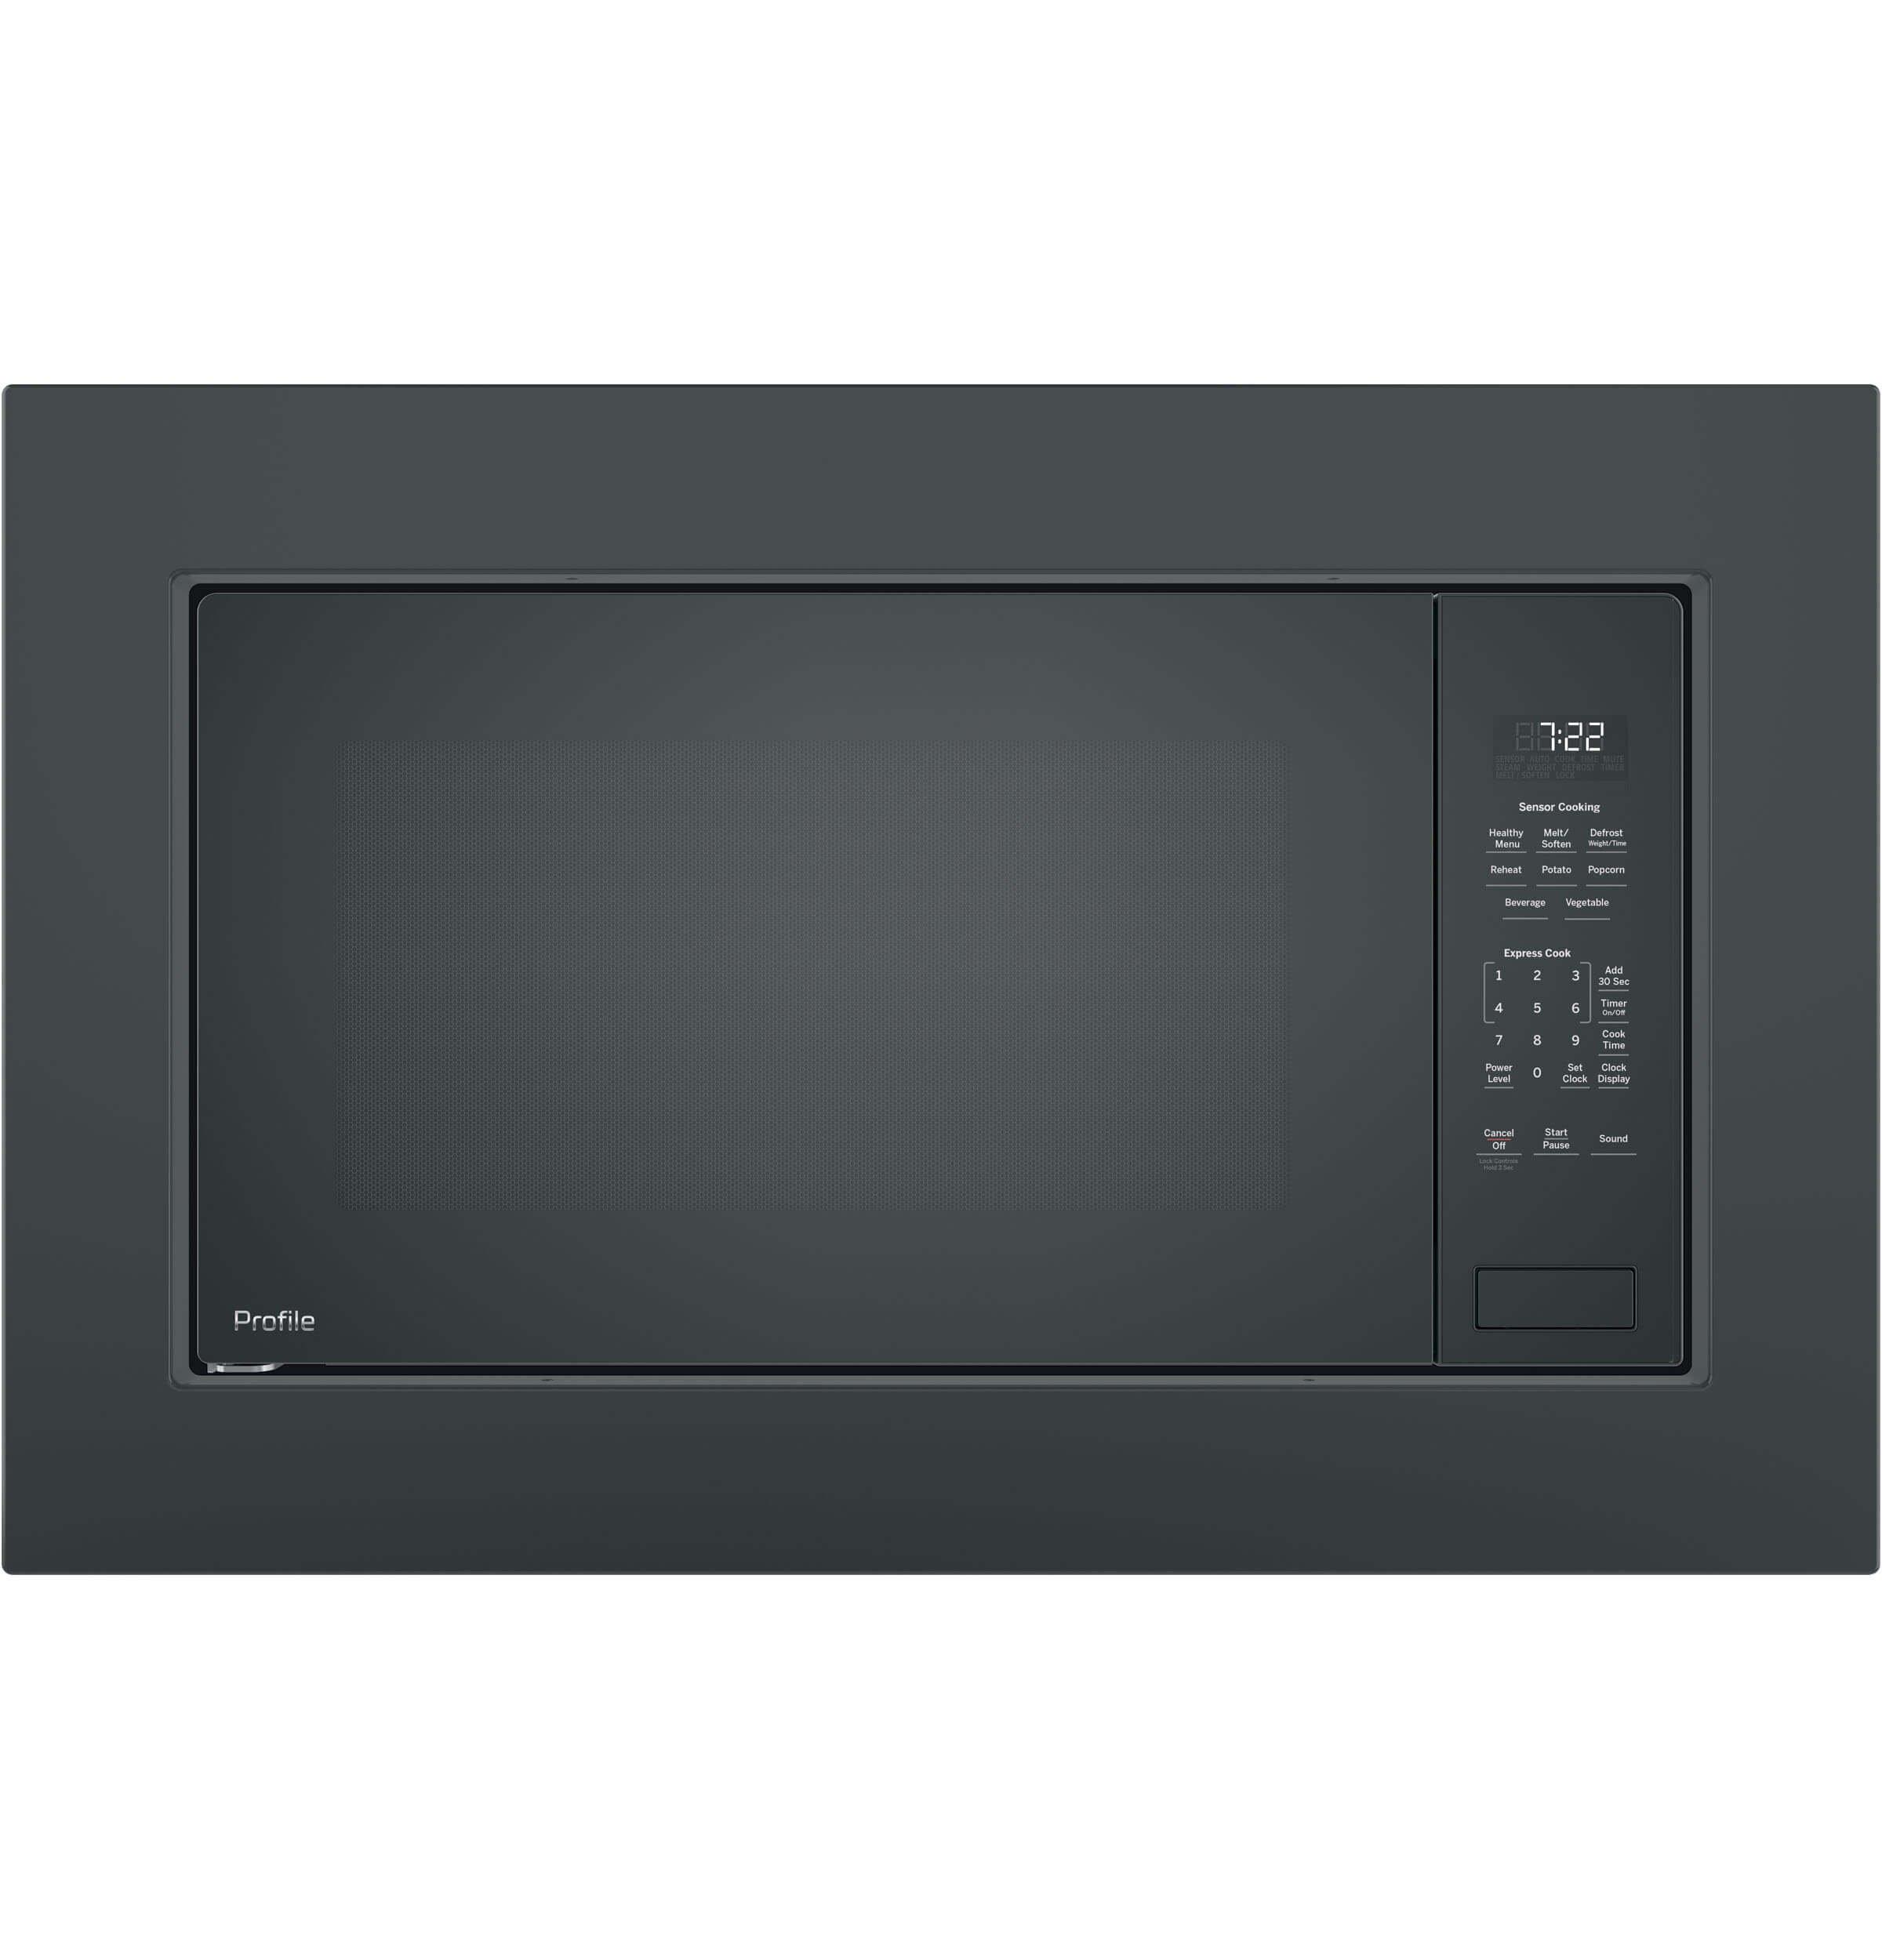 GE PEB7227DLBB Microwave Oven by GE (Image #1)